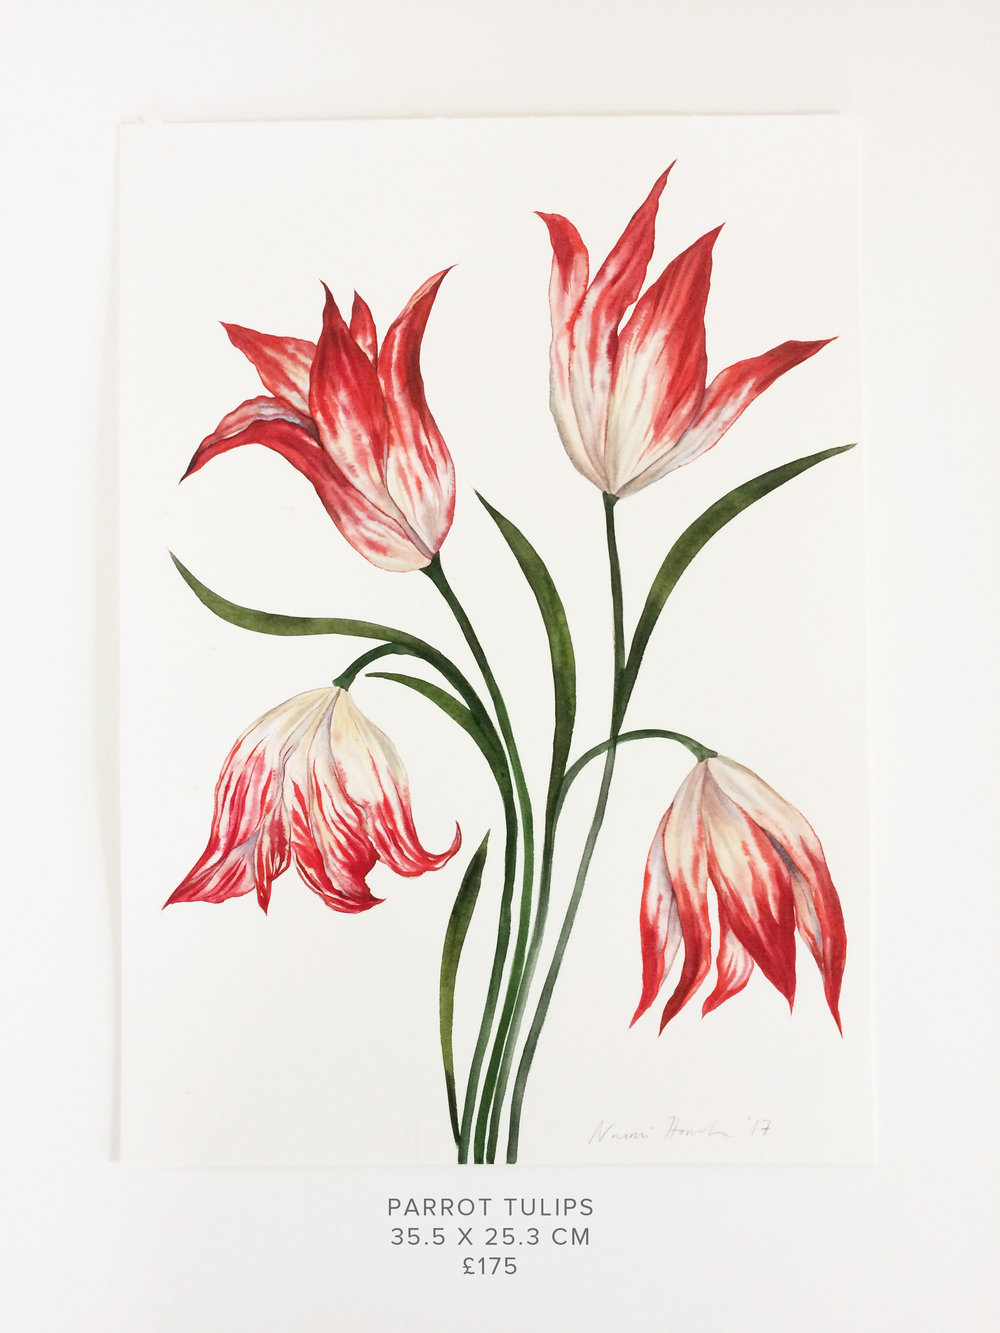 Parrot Tulips PS.jpg